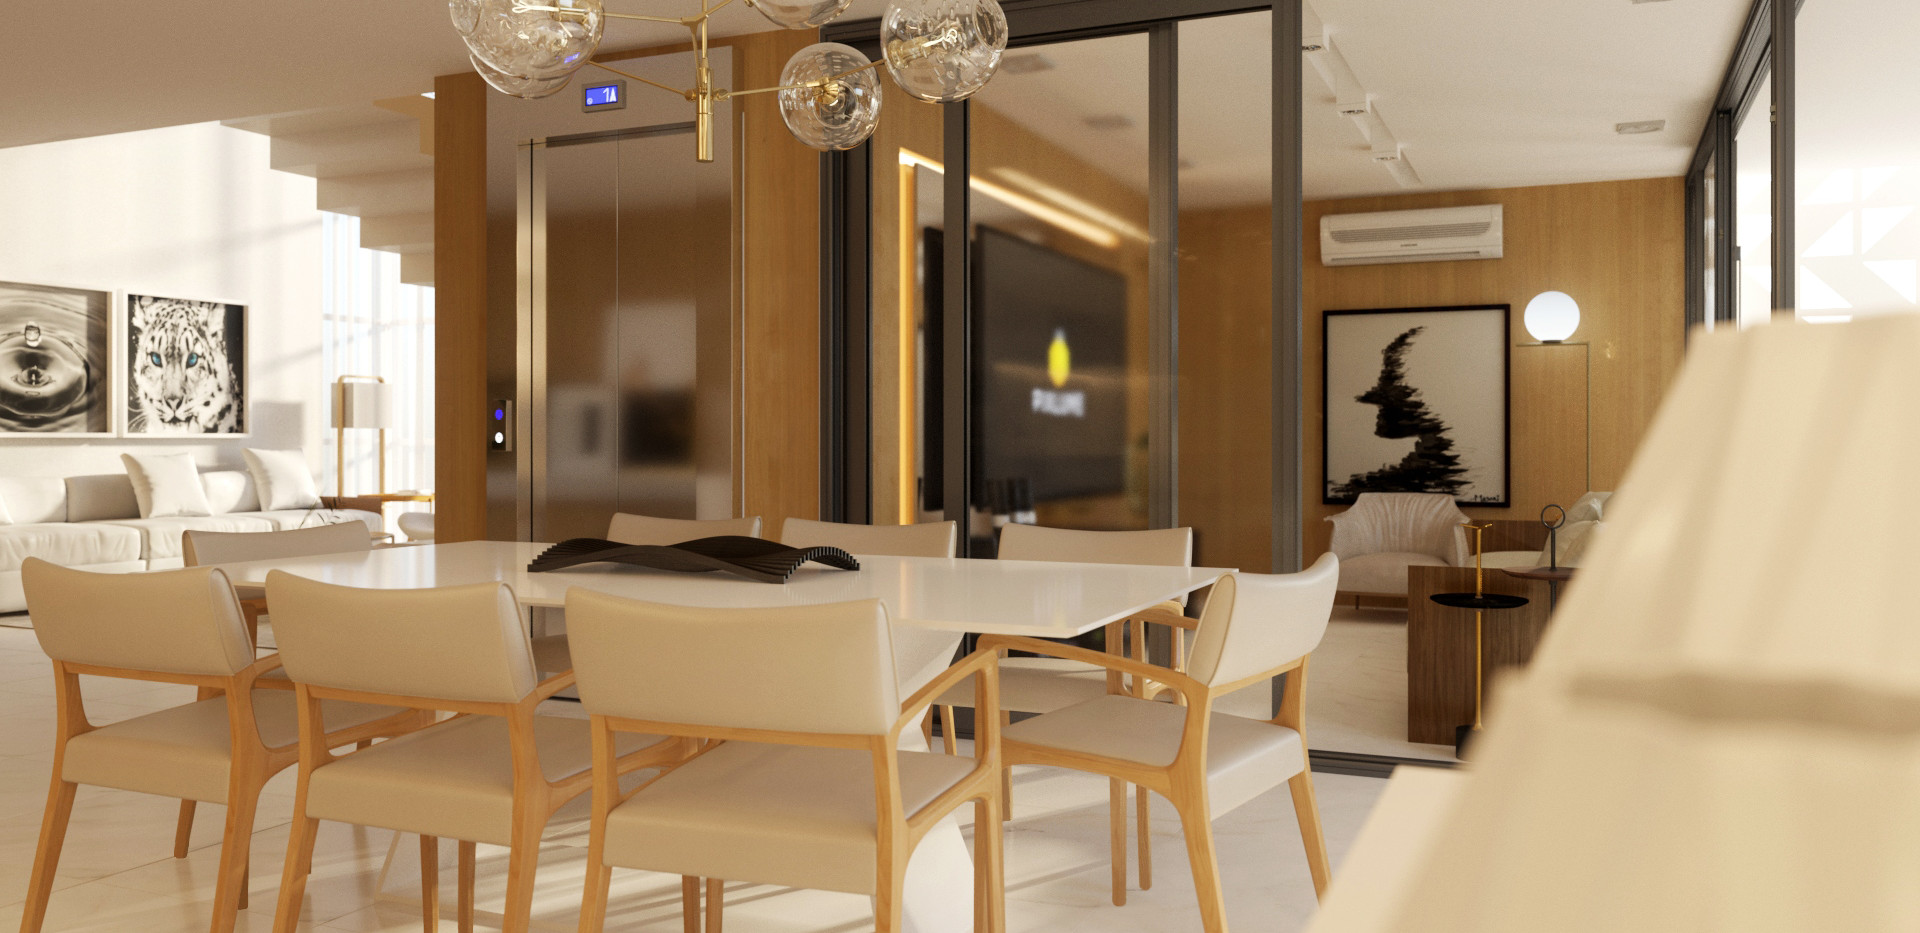 Pollyana - Sala de jantar